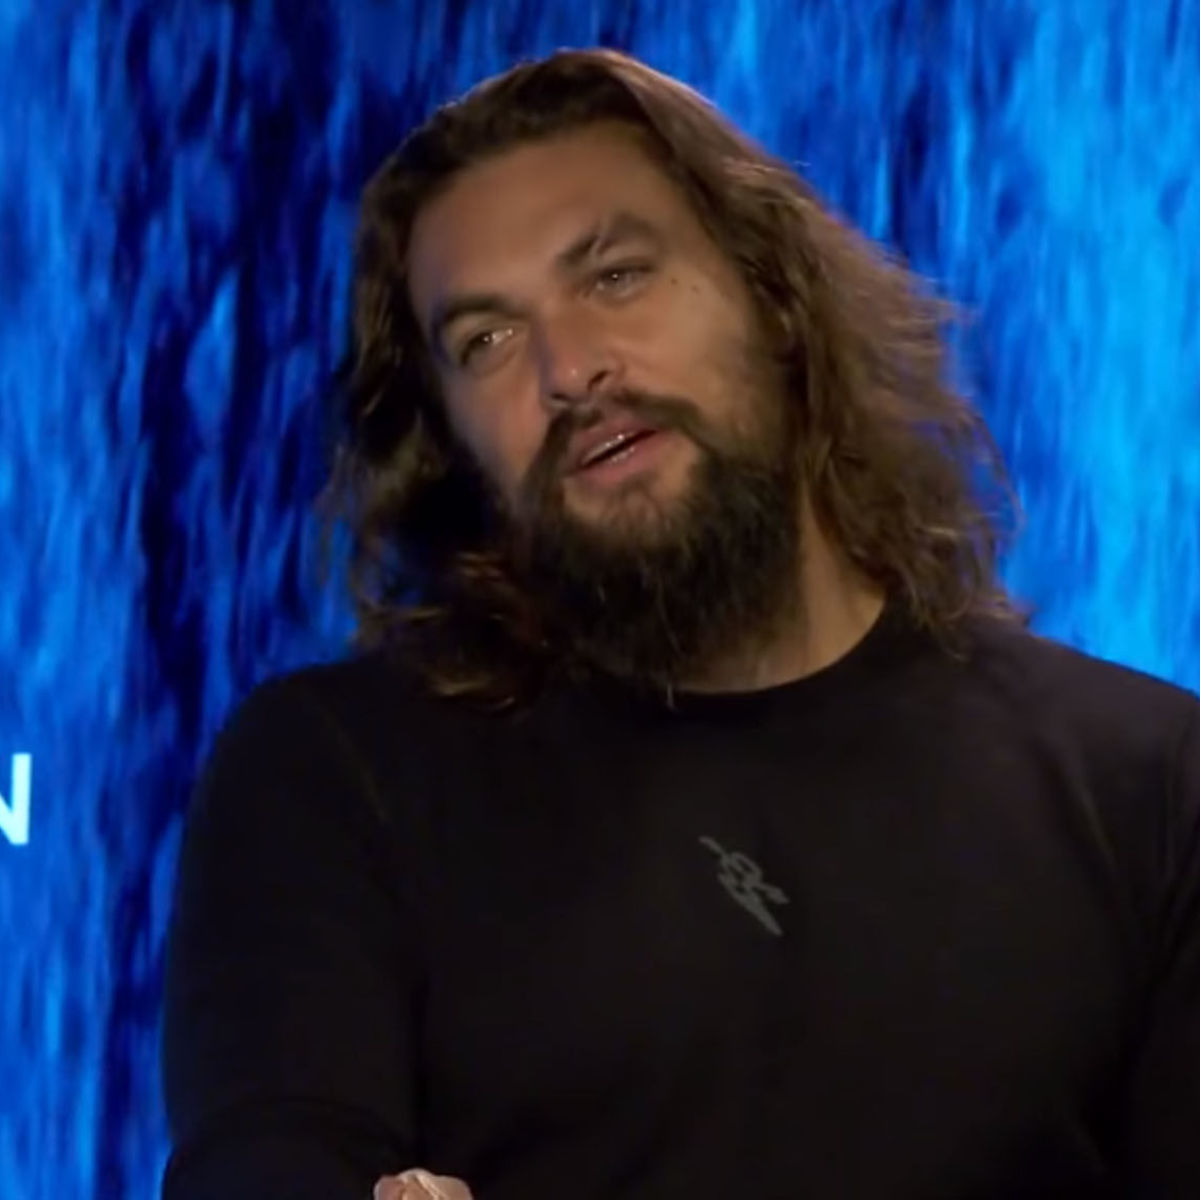 New Jason Momoa And Amber Heard Aquaman Image: WATCH: Jason Momoa And Amber Heard Talk Aquaman, Khal